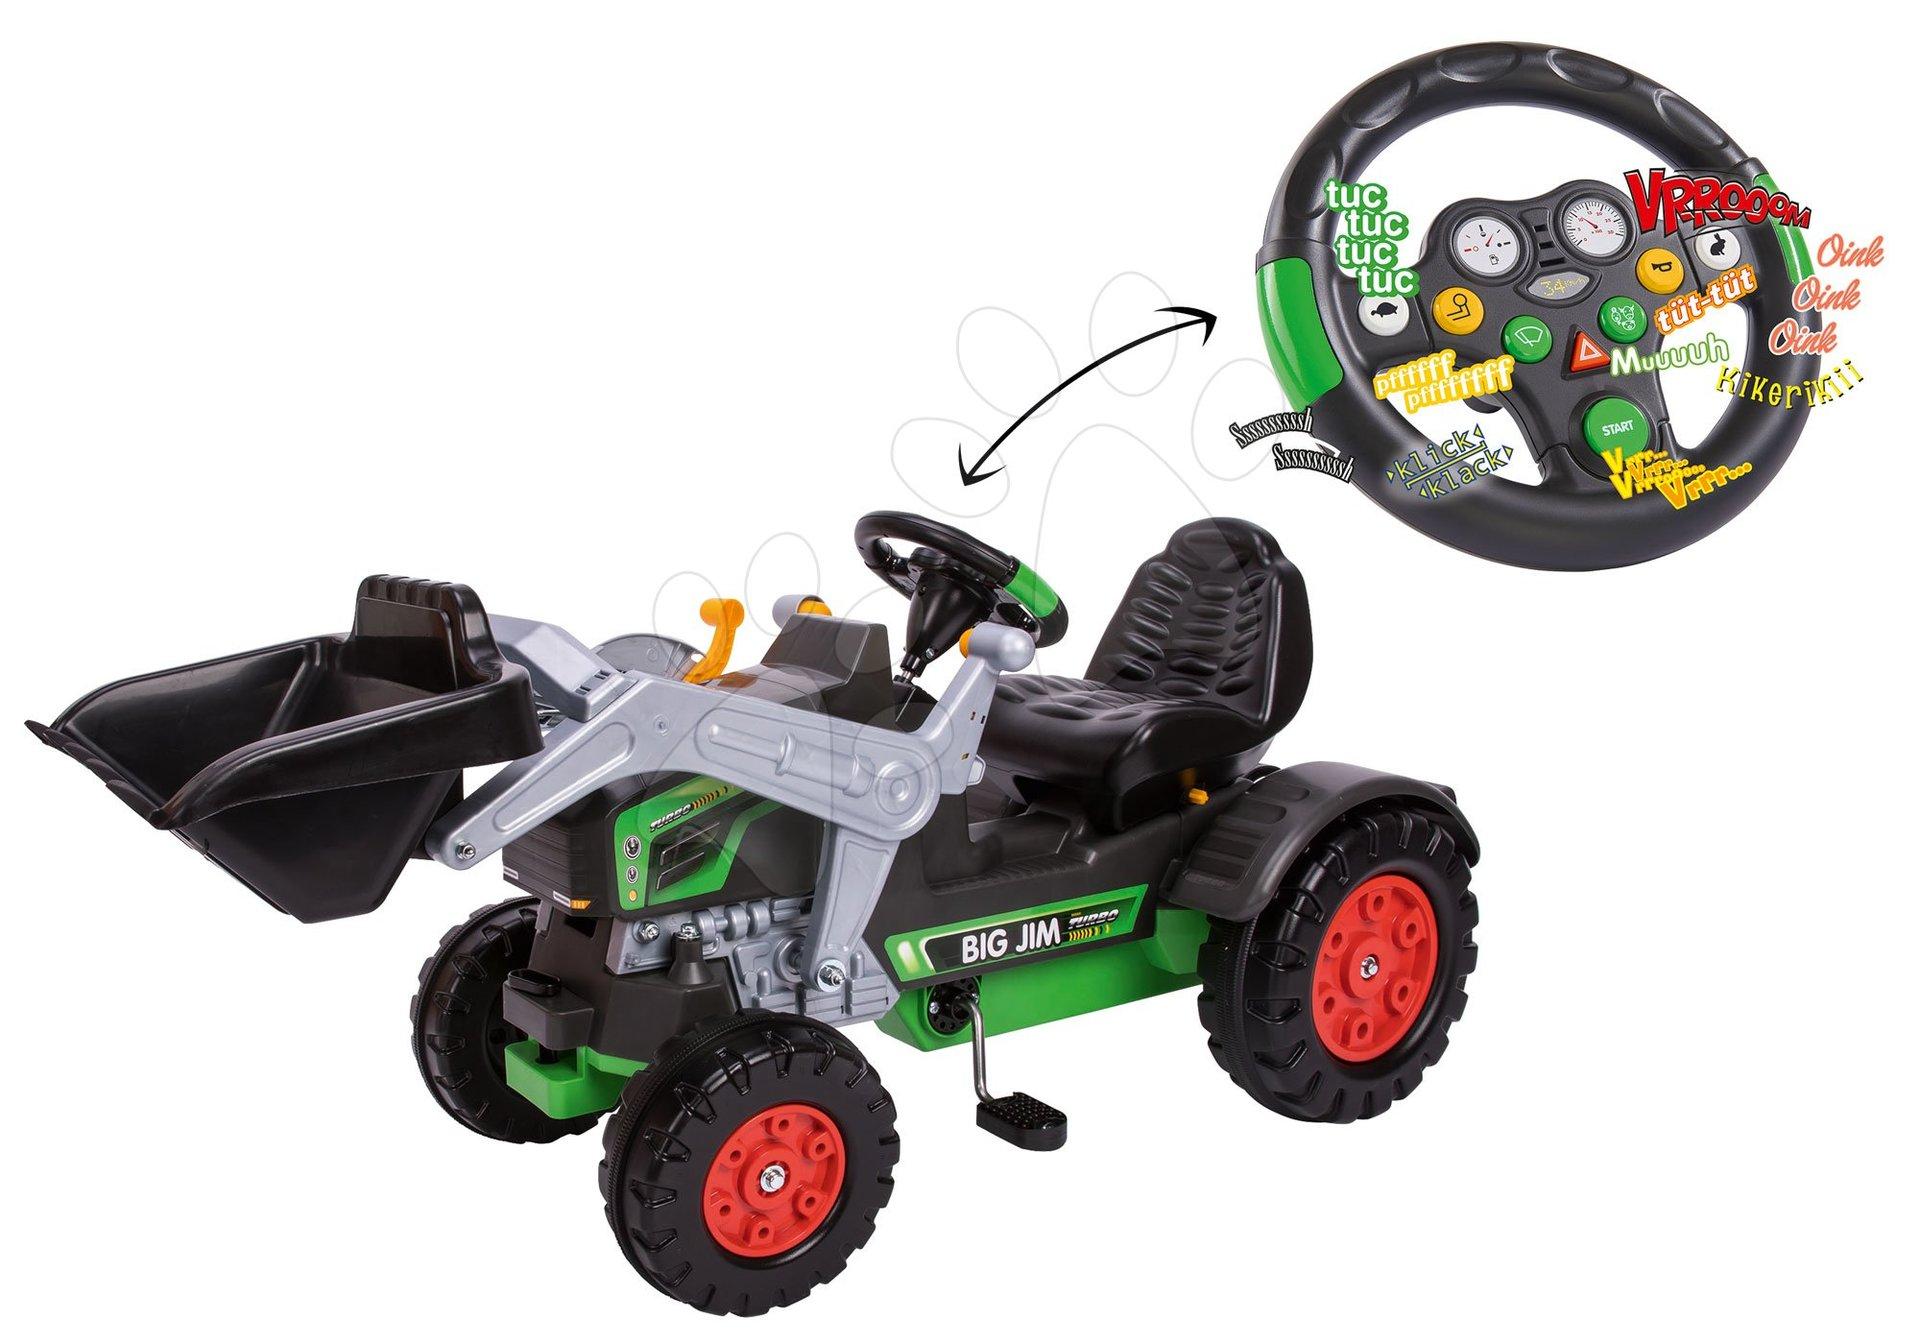 Traktor na pedala bager BIG Jim Turbo z interaktivnim volanom na verižni pogon